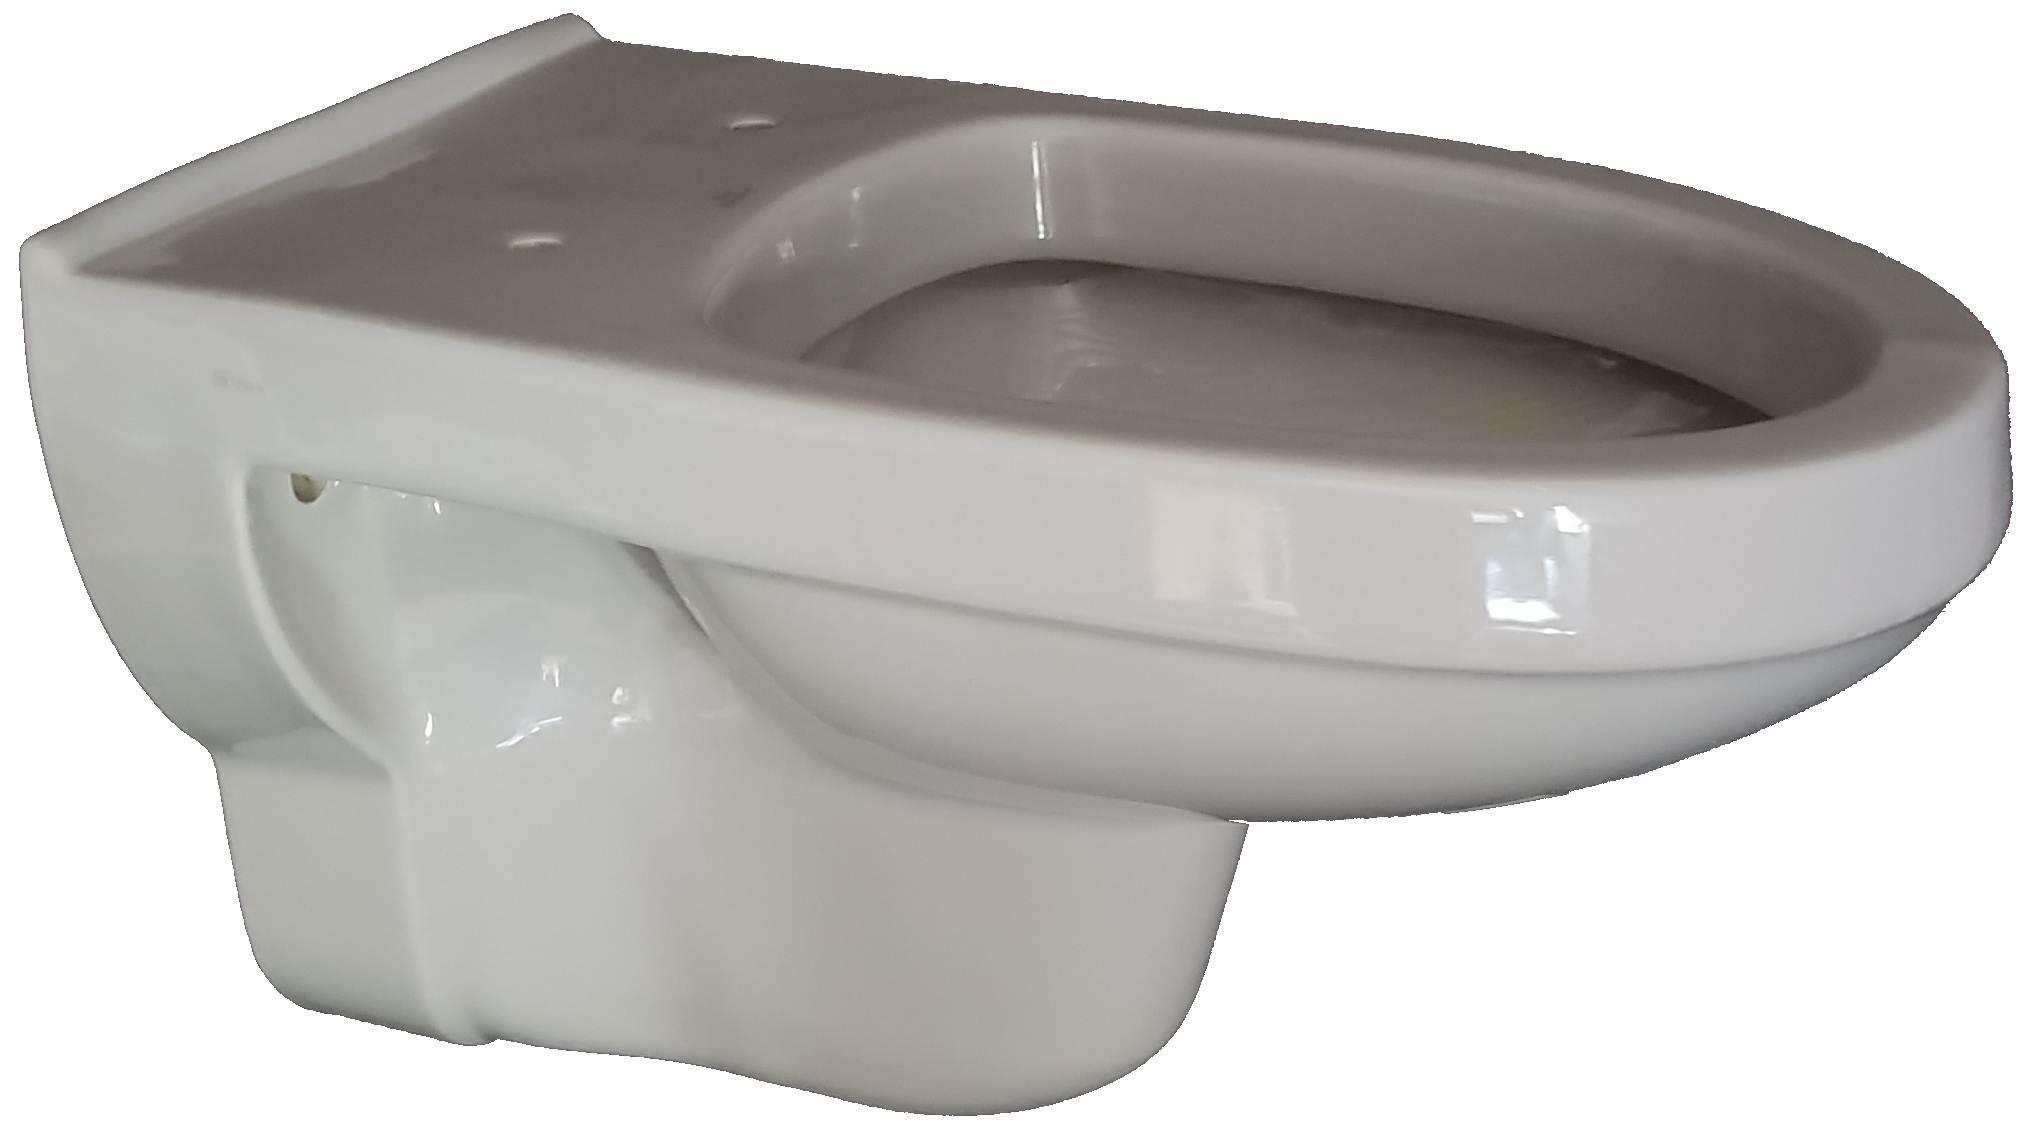 manhattan Wand-WC 56x34 cm Ideal-Standard Noblesse Bild 1